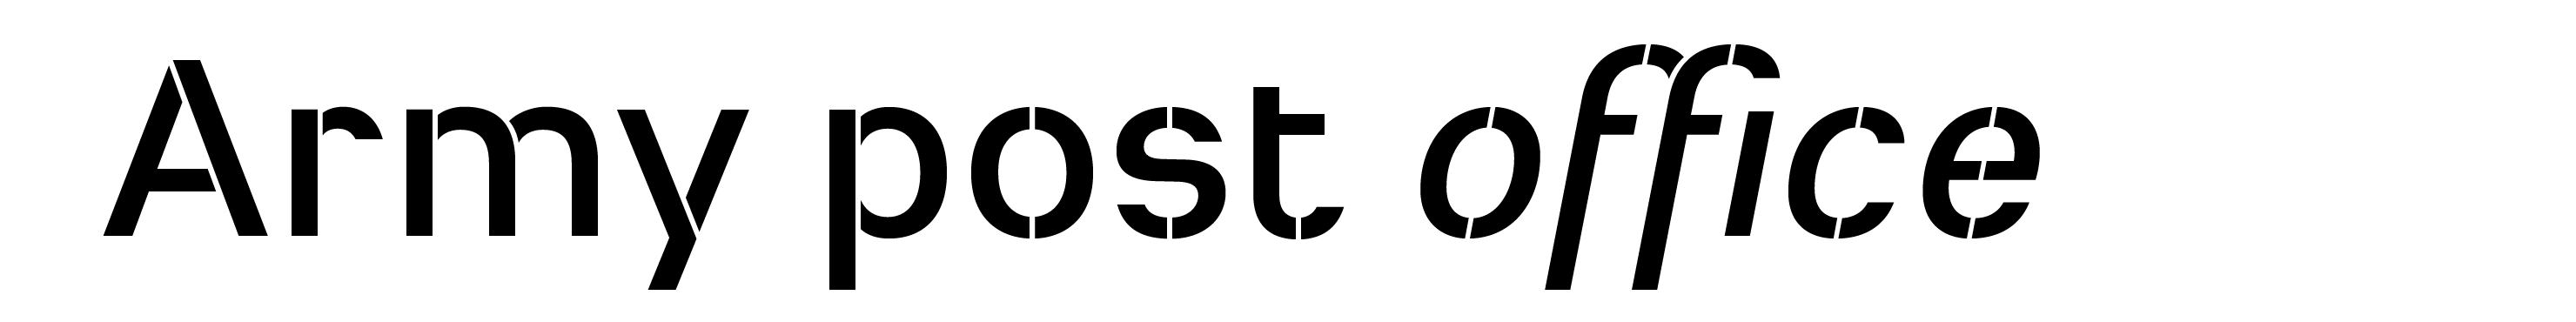 Typeface Heimat Stencil D010 Atlas Font Foundry